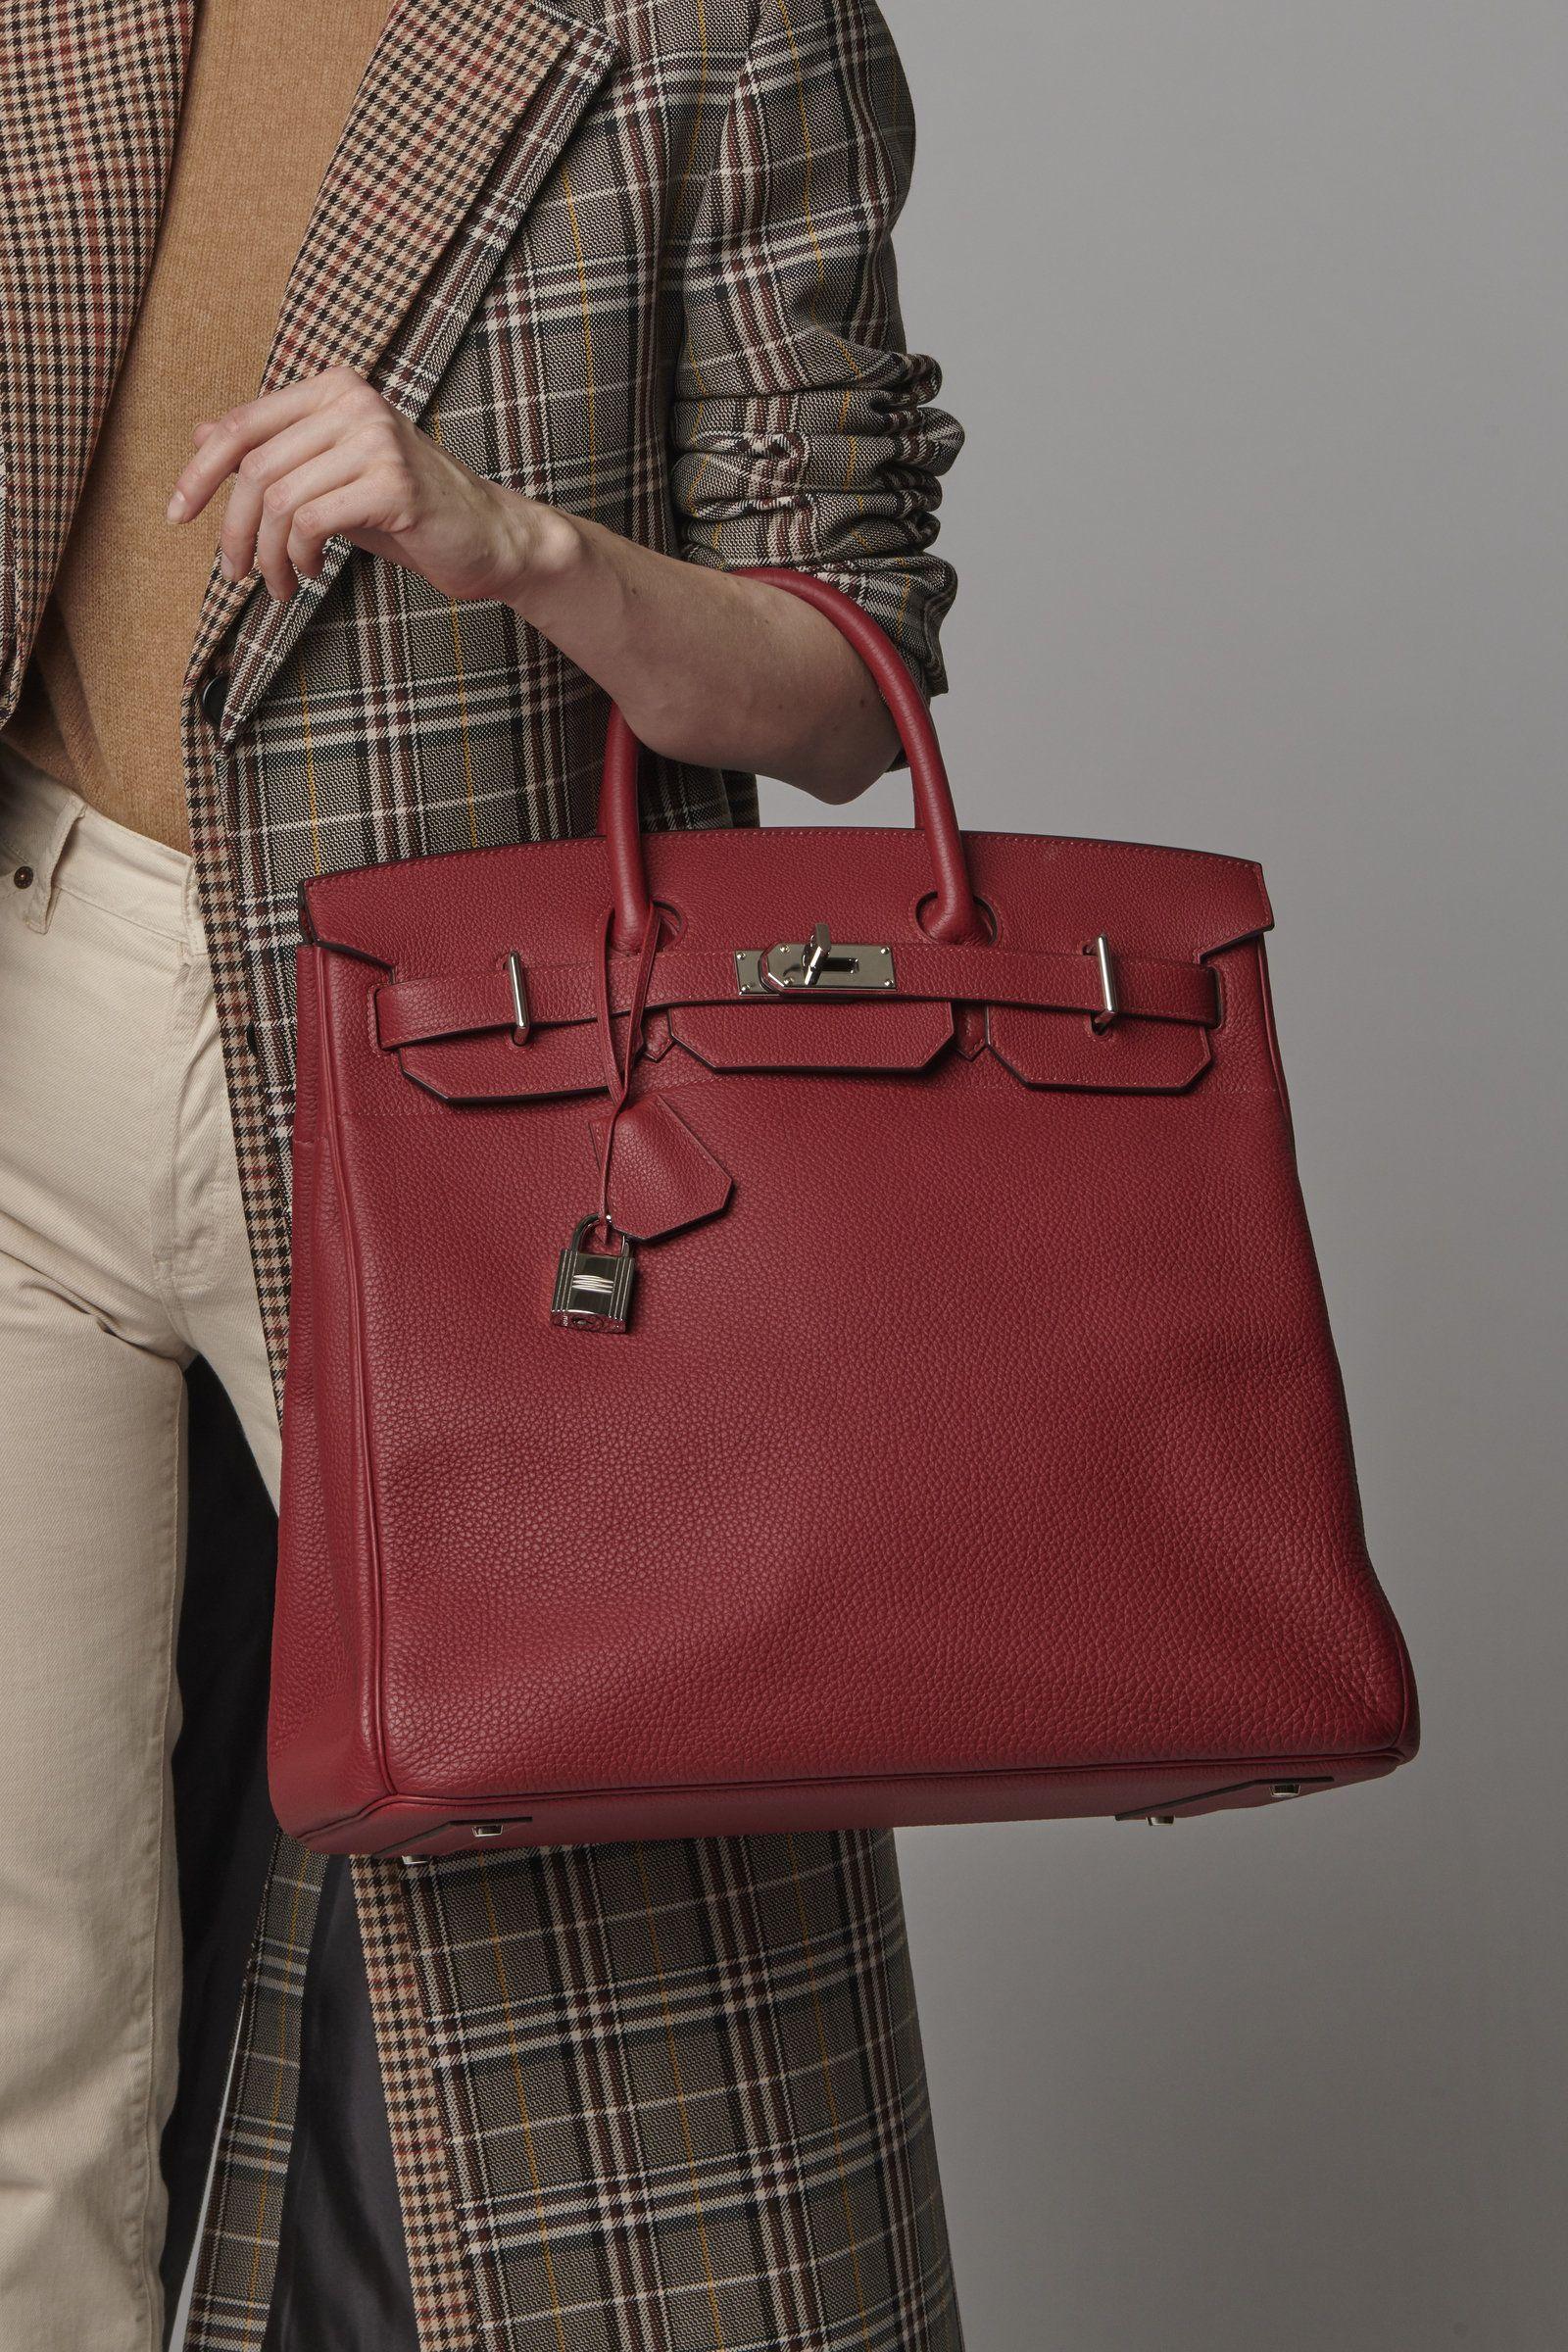 789c982644 Hermès 40cm Rouge Grenat Togo Leather HAC #Birkin | Bags/Purses in ...